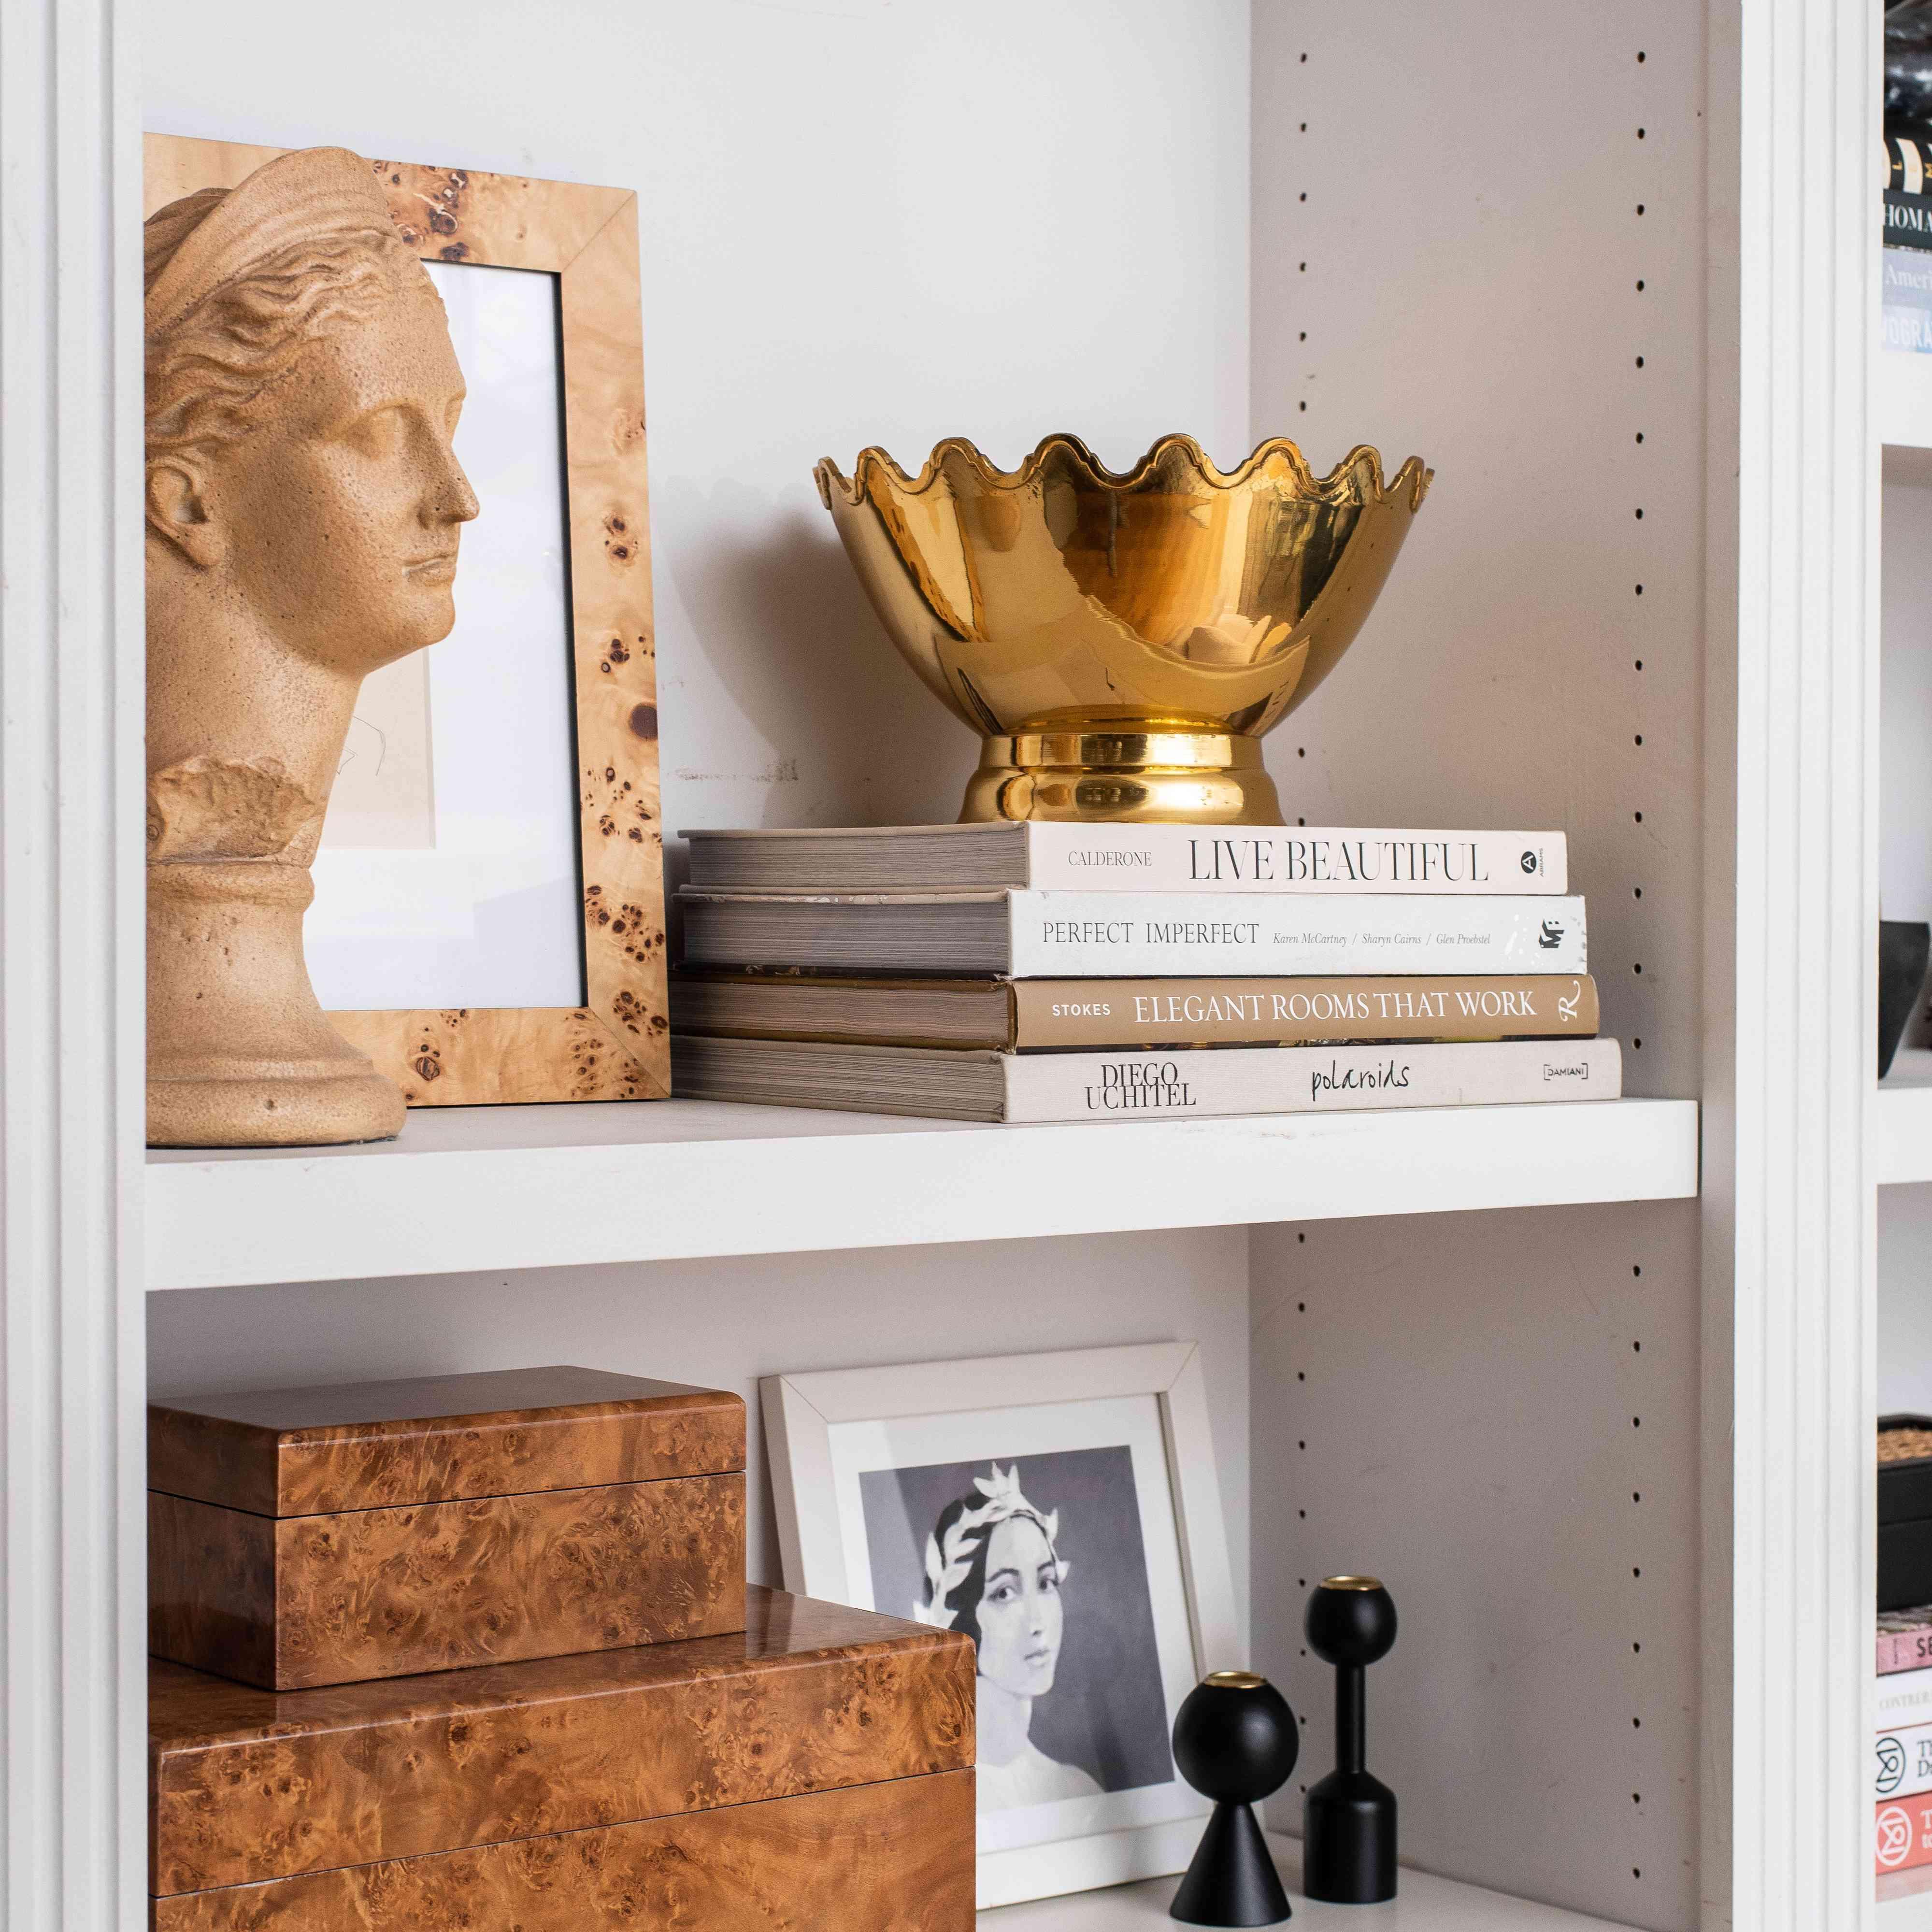 Bust on a bookshelf.